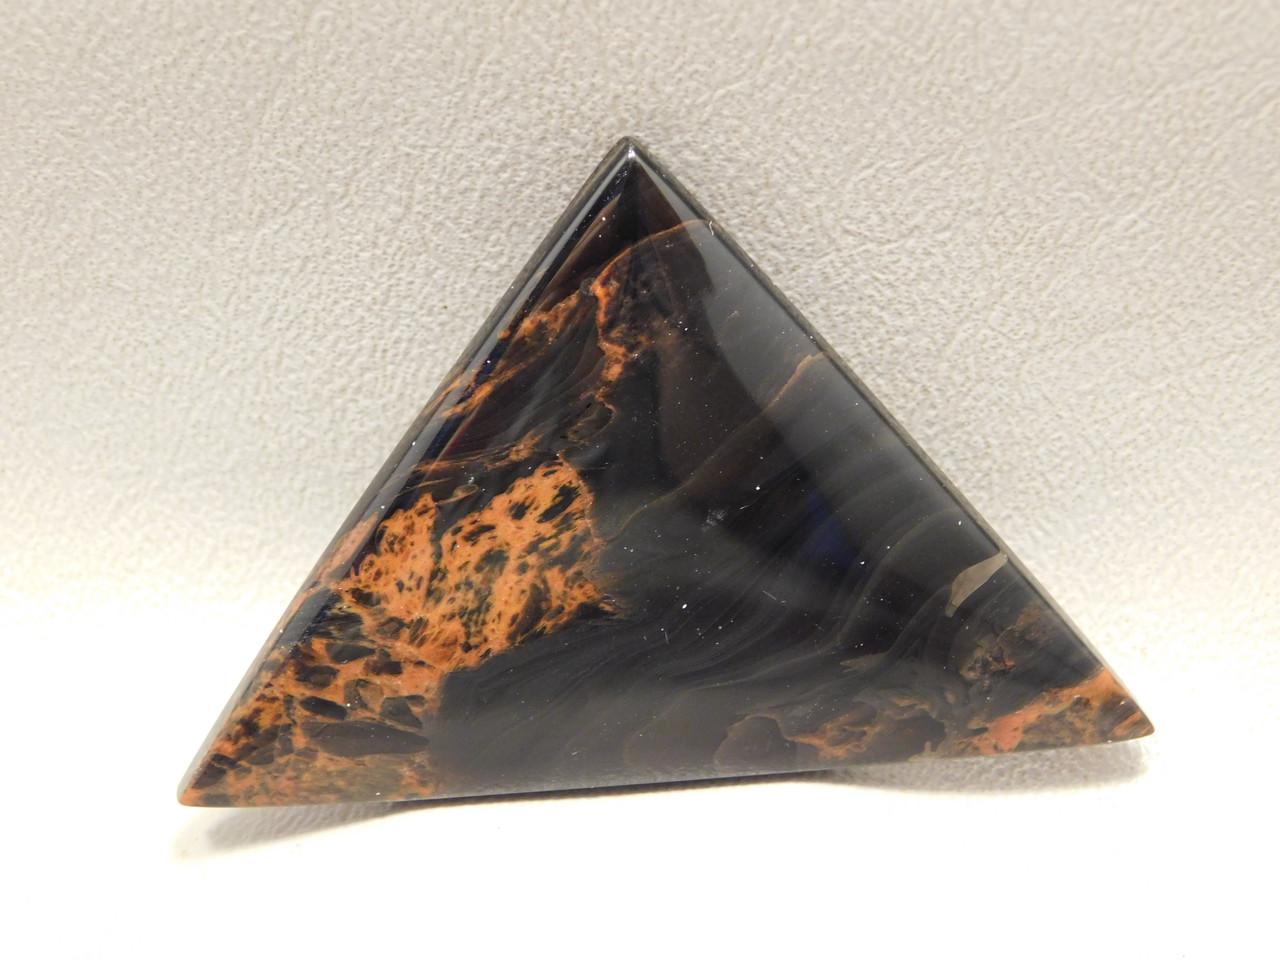 Mahogany Obsidian Large Collector Cabochon #XL1